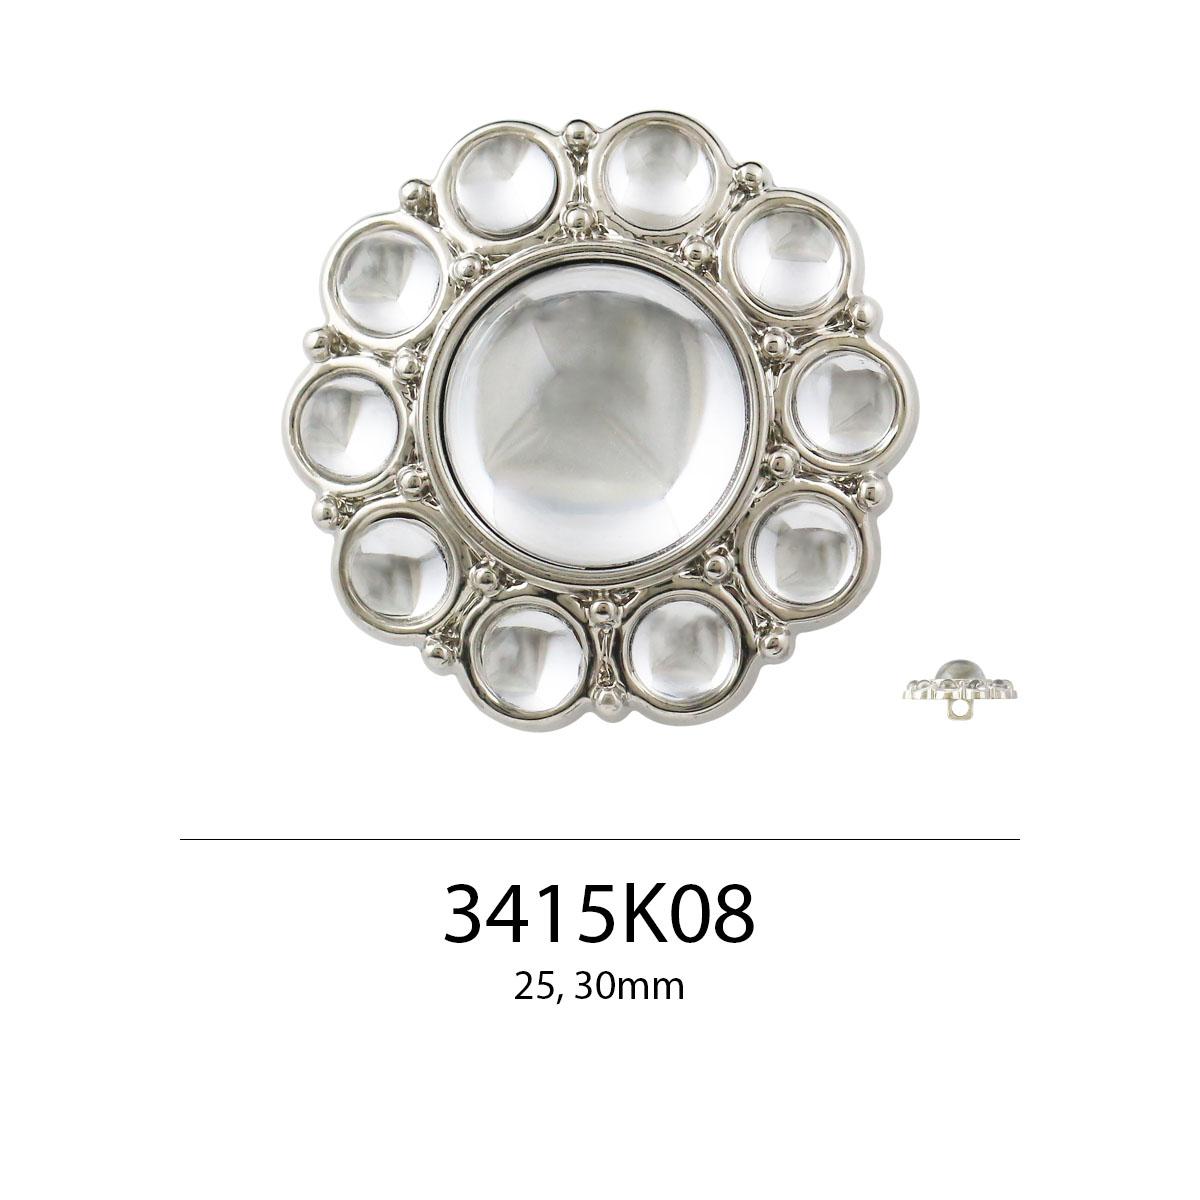 Pabrik Grosir Tombol Berlian Imitasi Besar 25Mm 31Mm Warna Mode AW21 Berbentuk Bulat untuk Kerajinan DIY